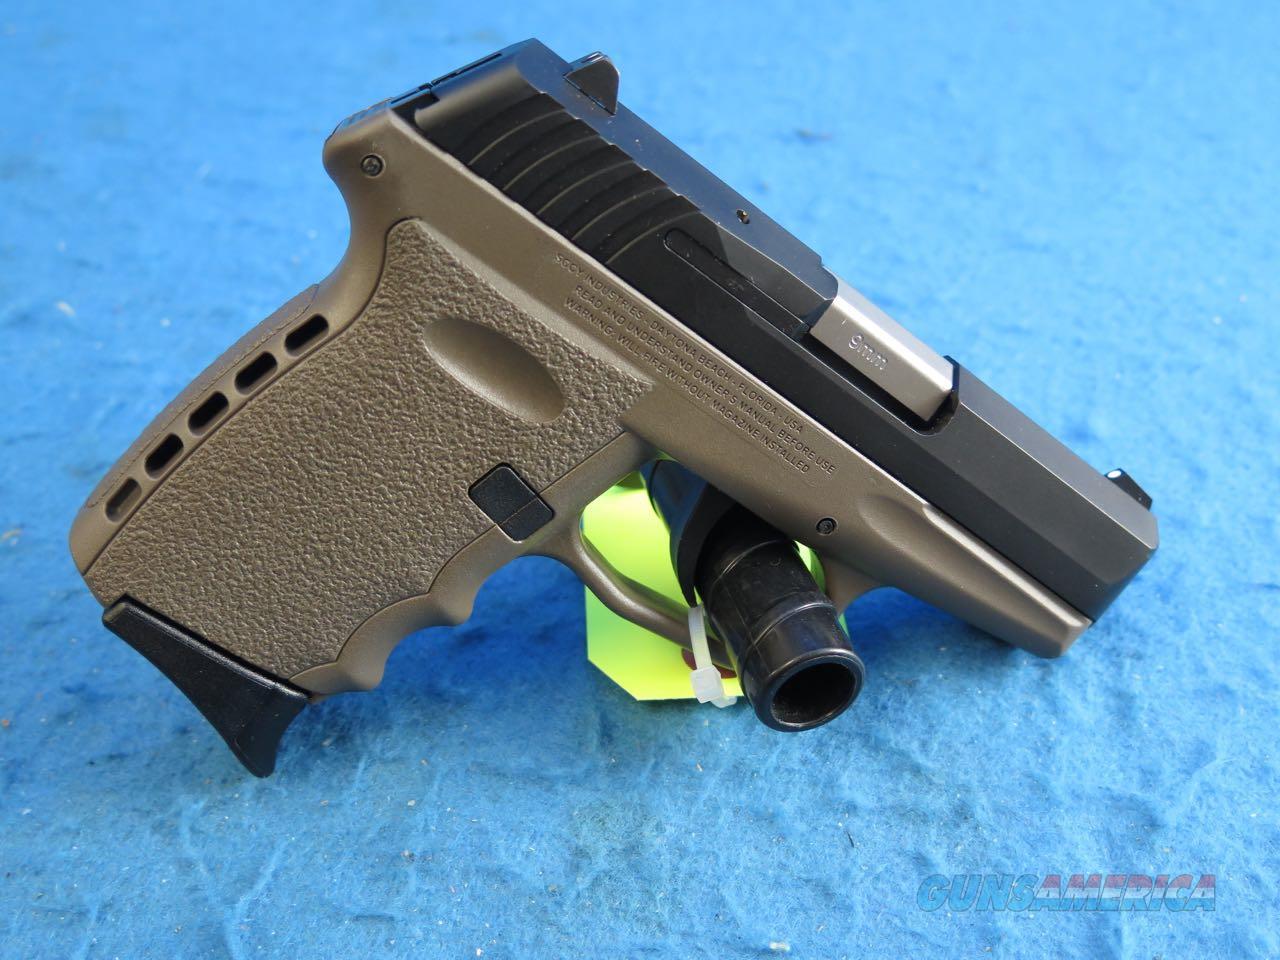 SCCY Model CPX-2 CBSG 9mm Pistol FDE/Black **New**  Guns > Pistols > SCCY Pistols > CPX2